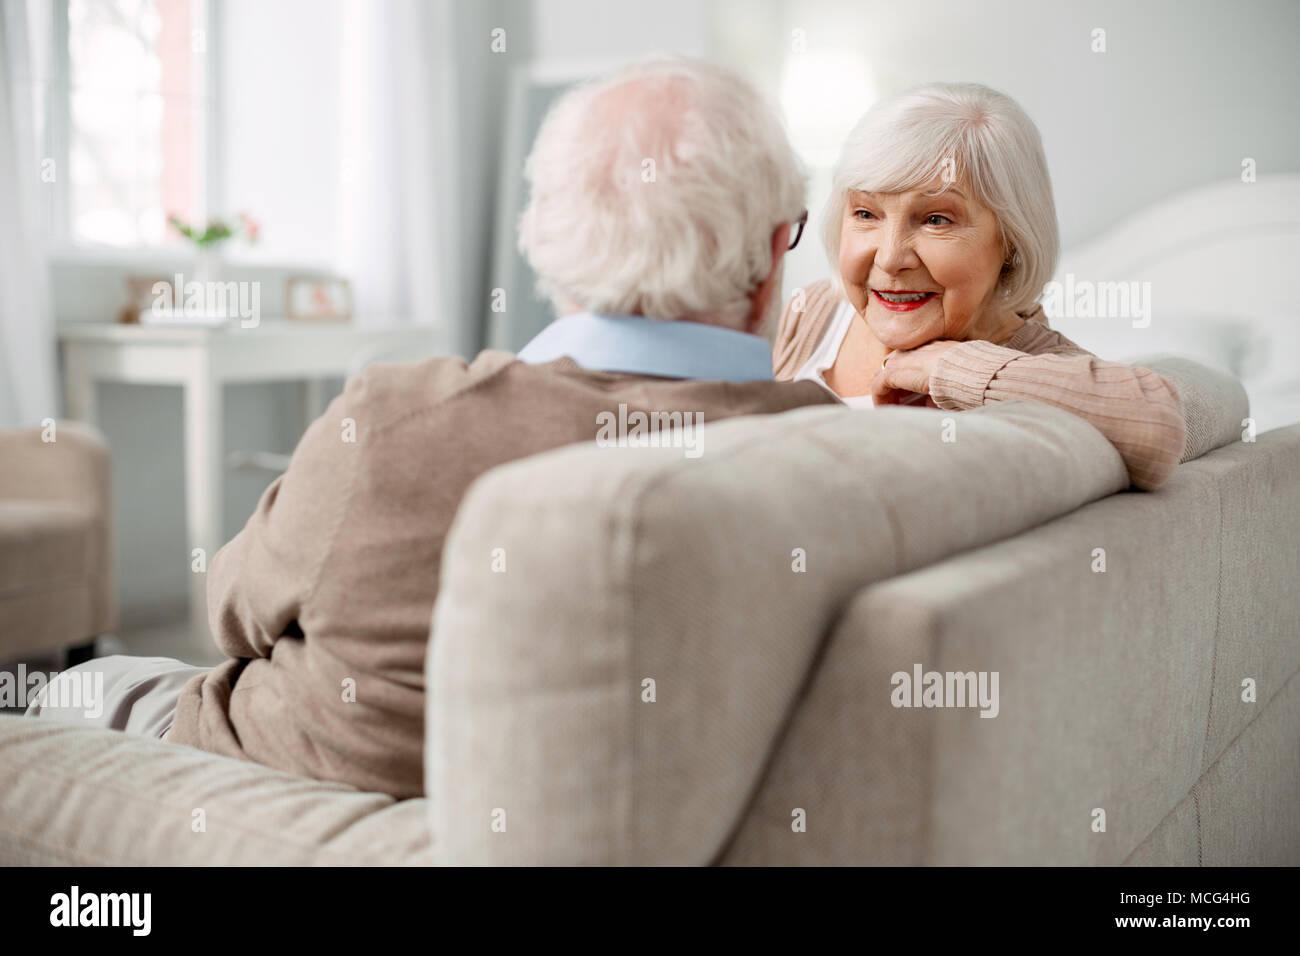 Positive ältere Frau an ihre Ehemänner Gesicht Stockbild